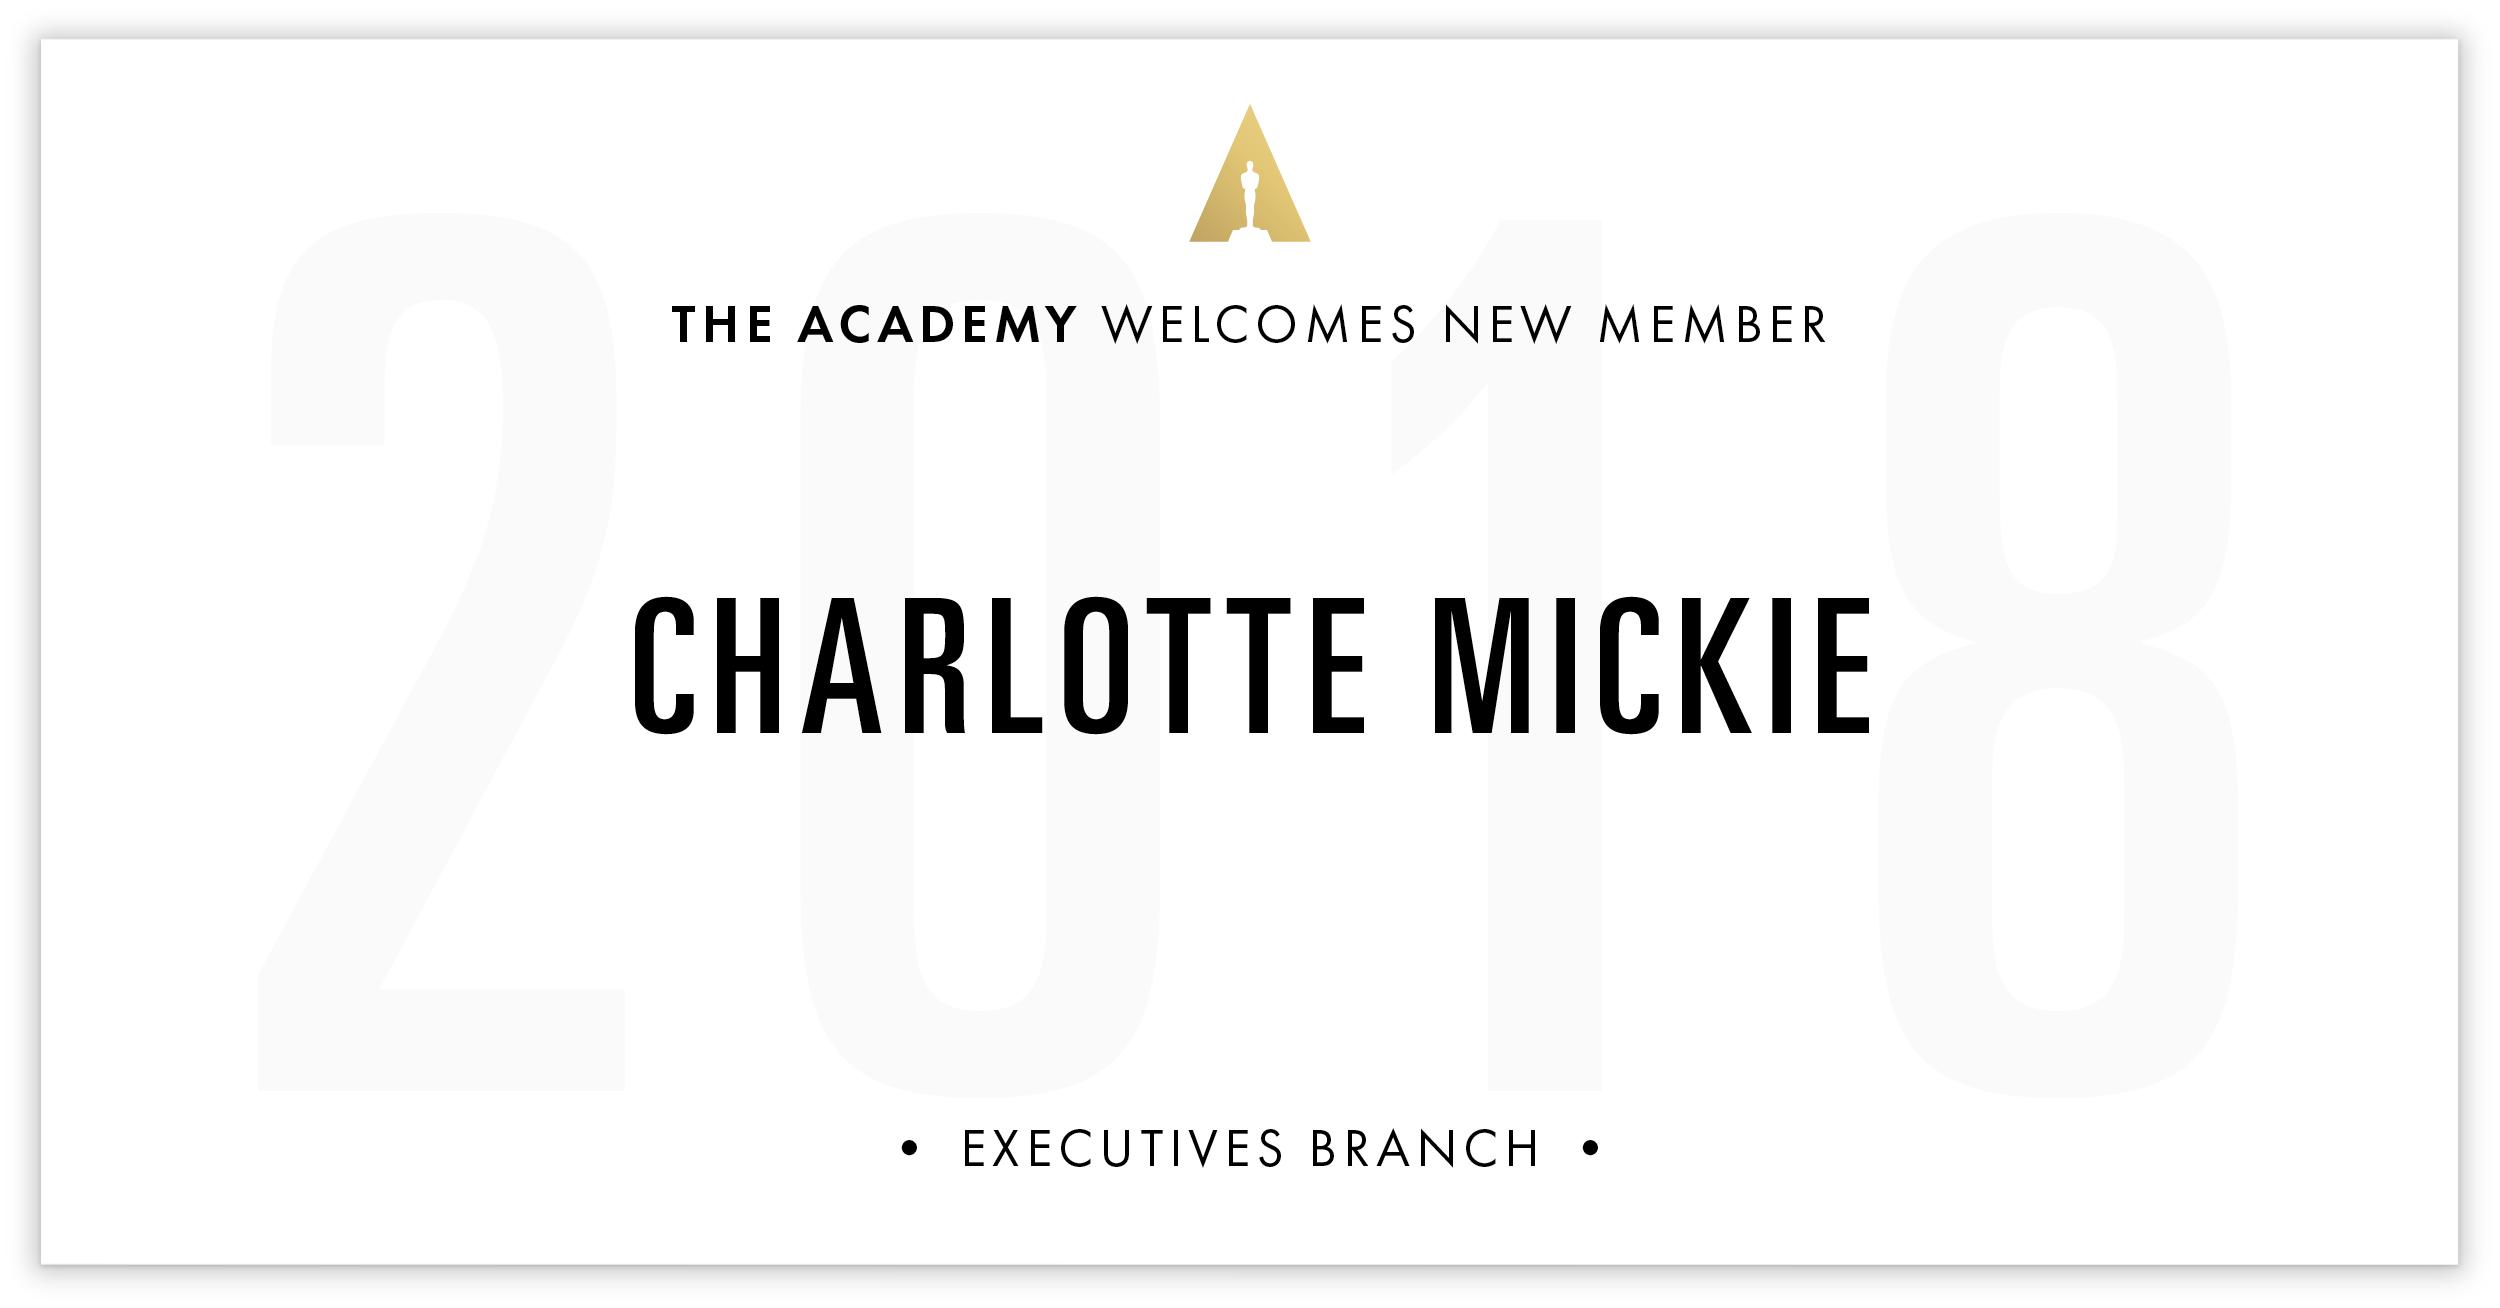 Charlotte Mickie is invited!